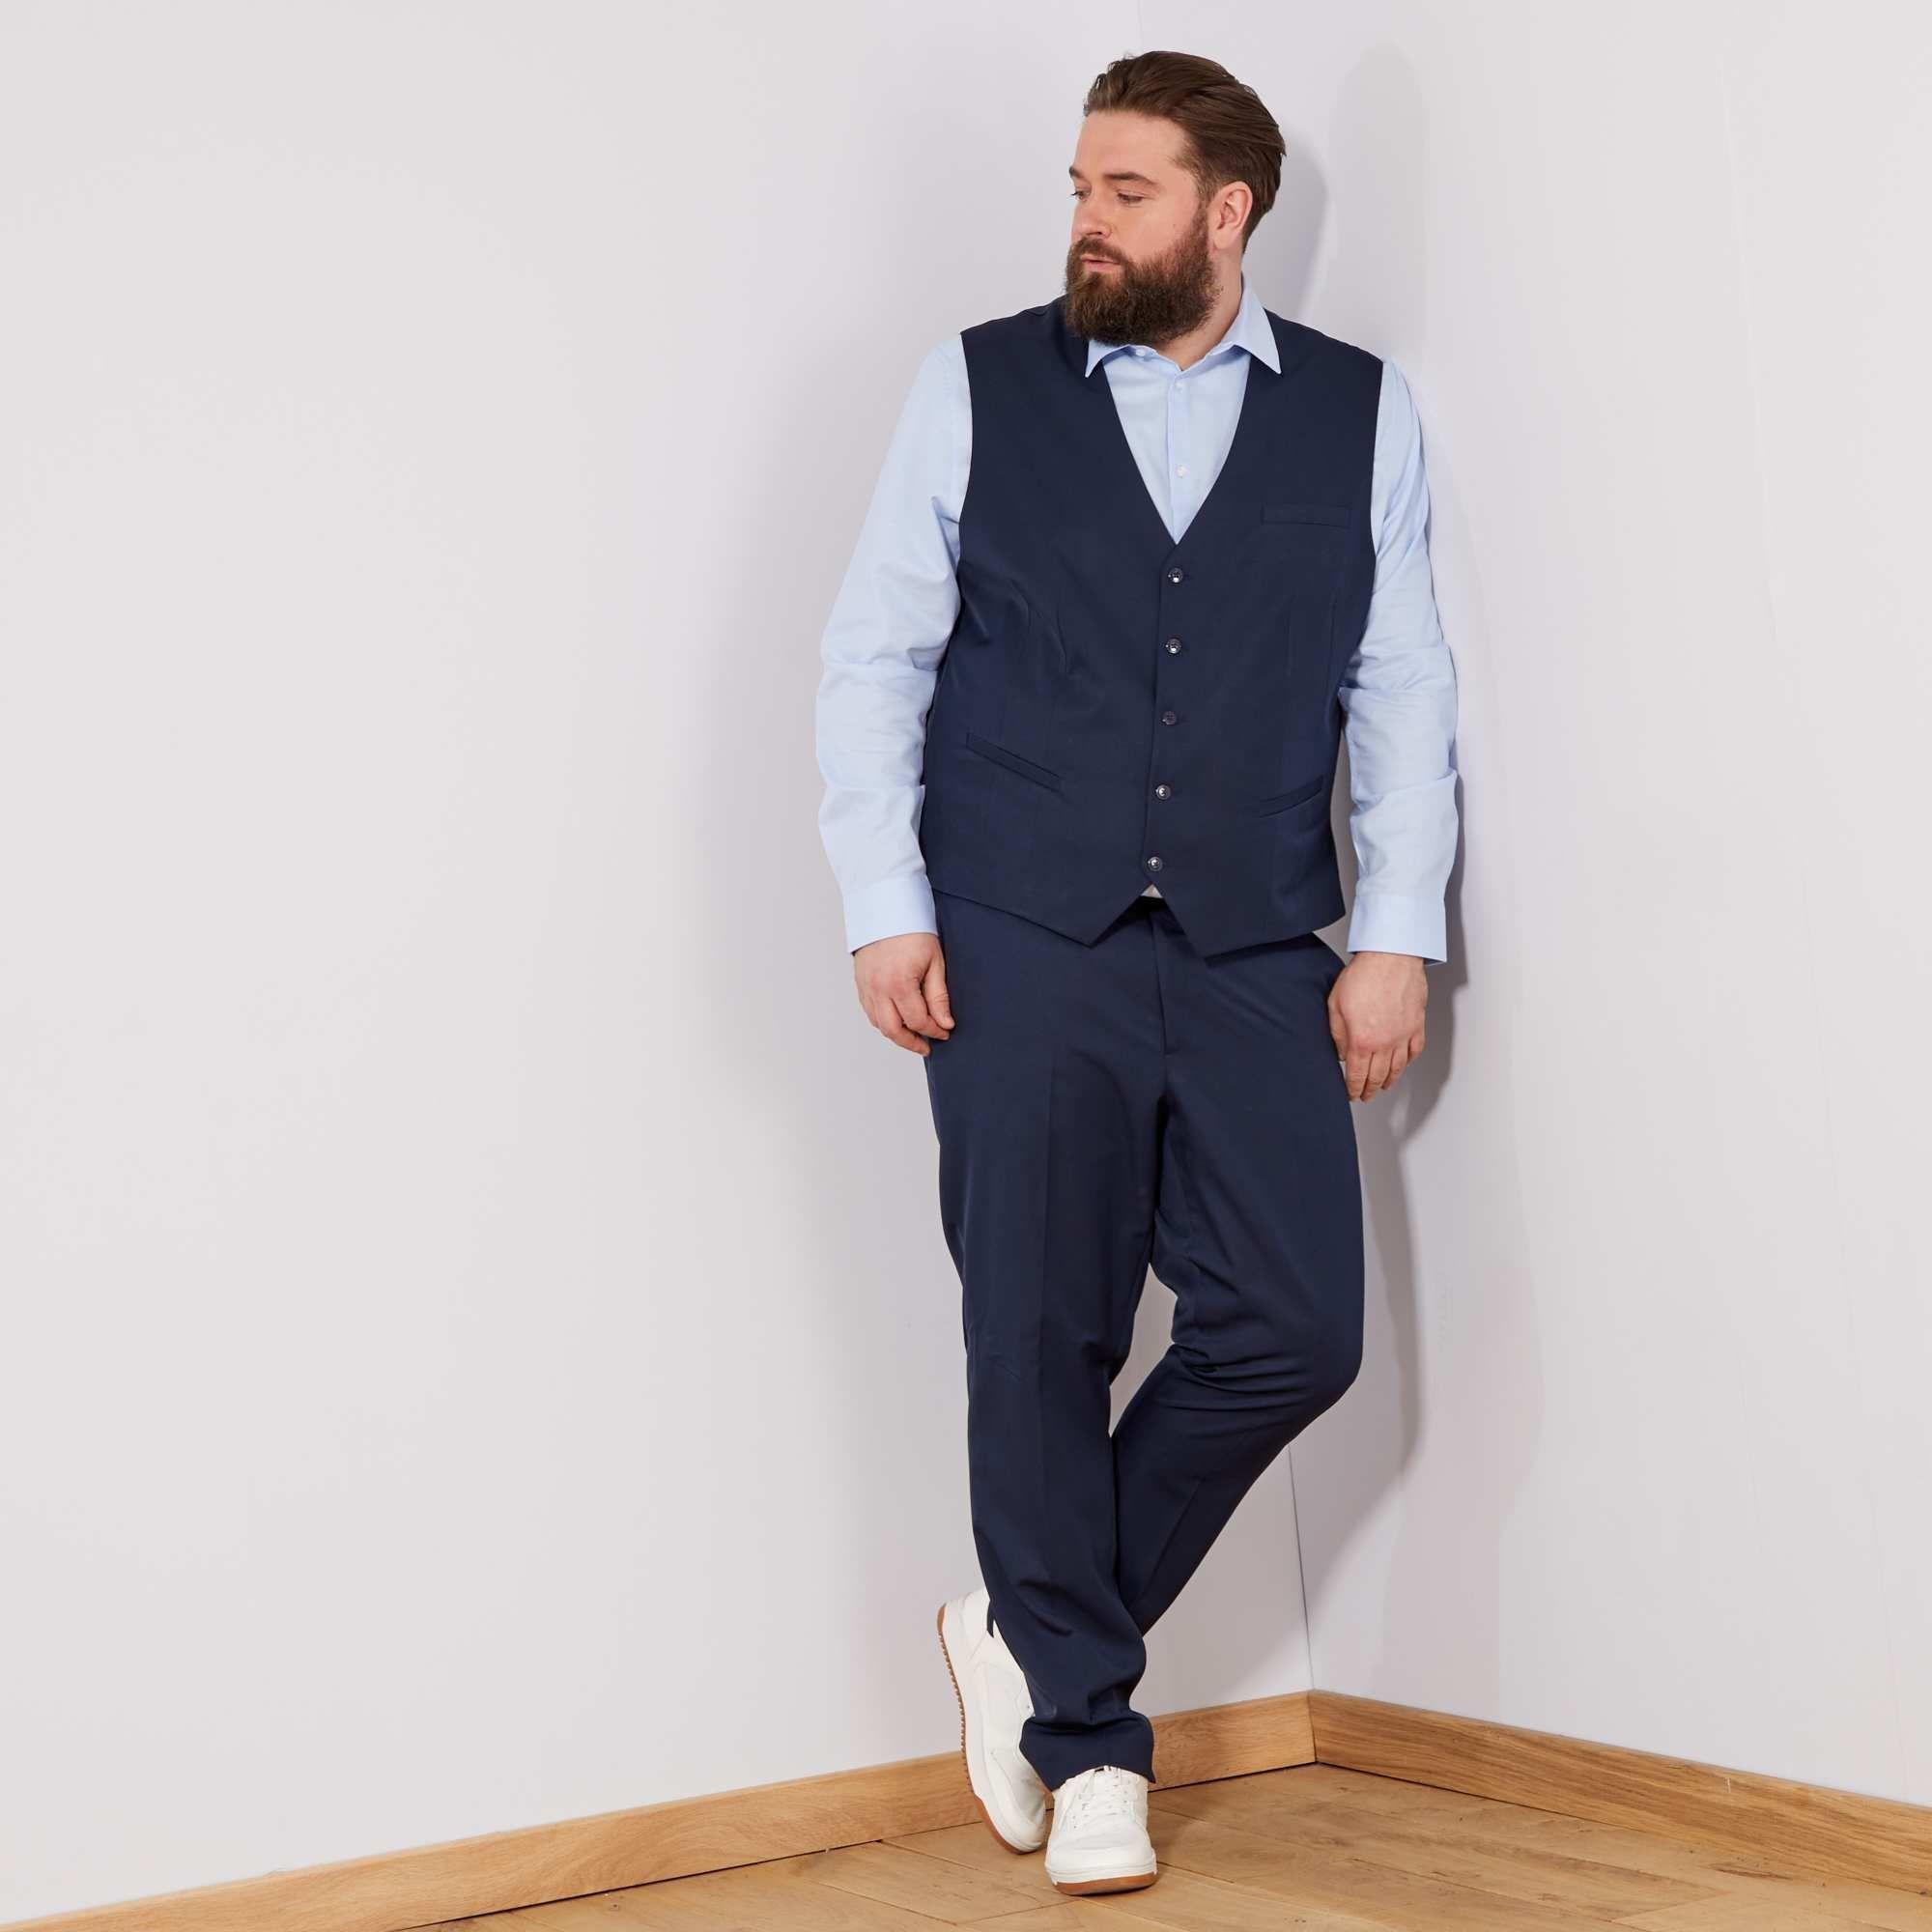 Abiti Eleganti Uomo Scontati.Pantaloni Abito Regular Tinta Unita Pantaloni Blu Marino Abiti